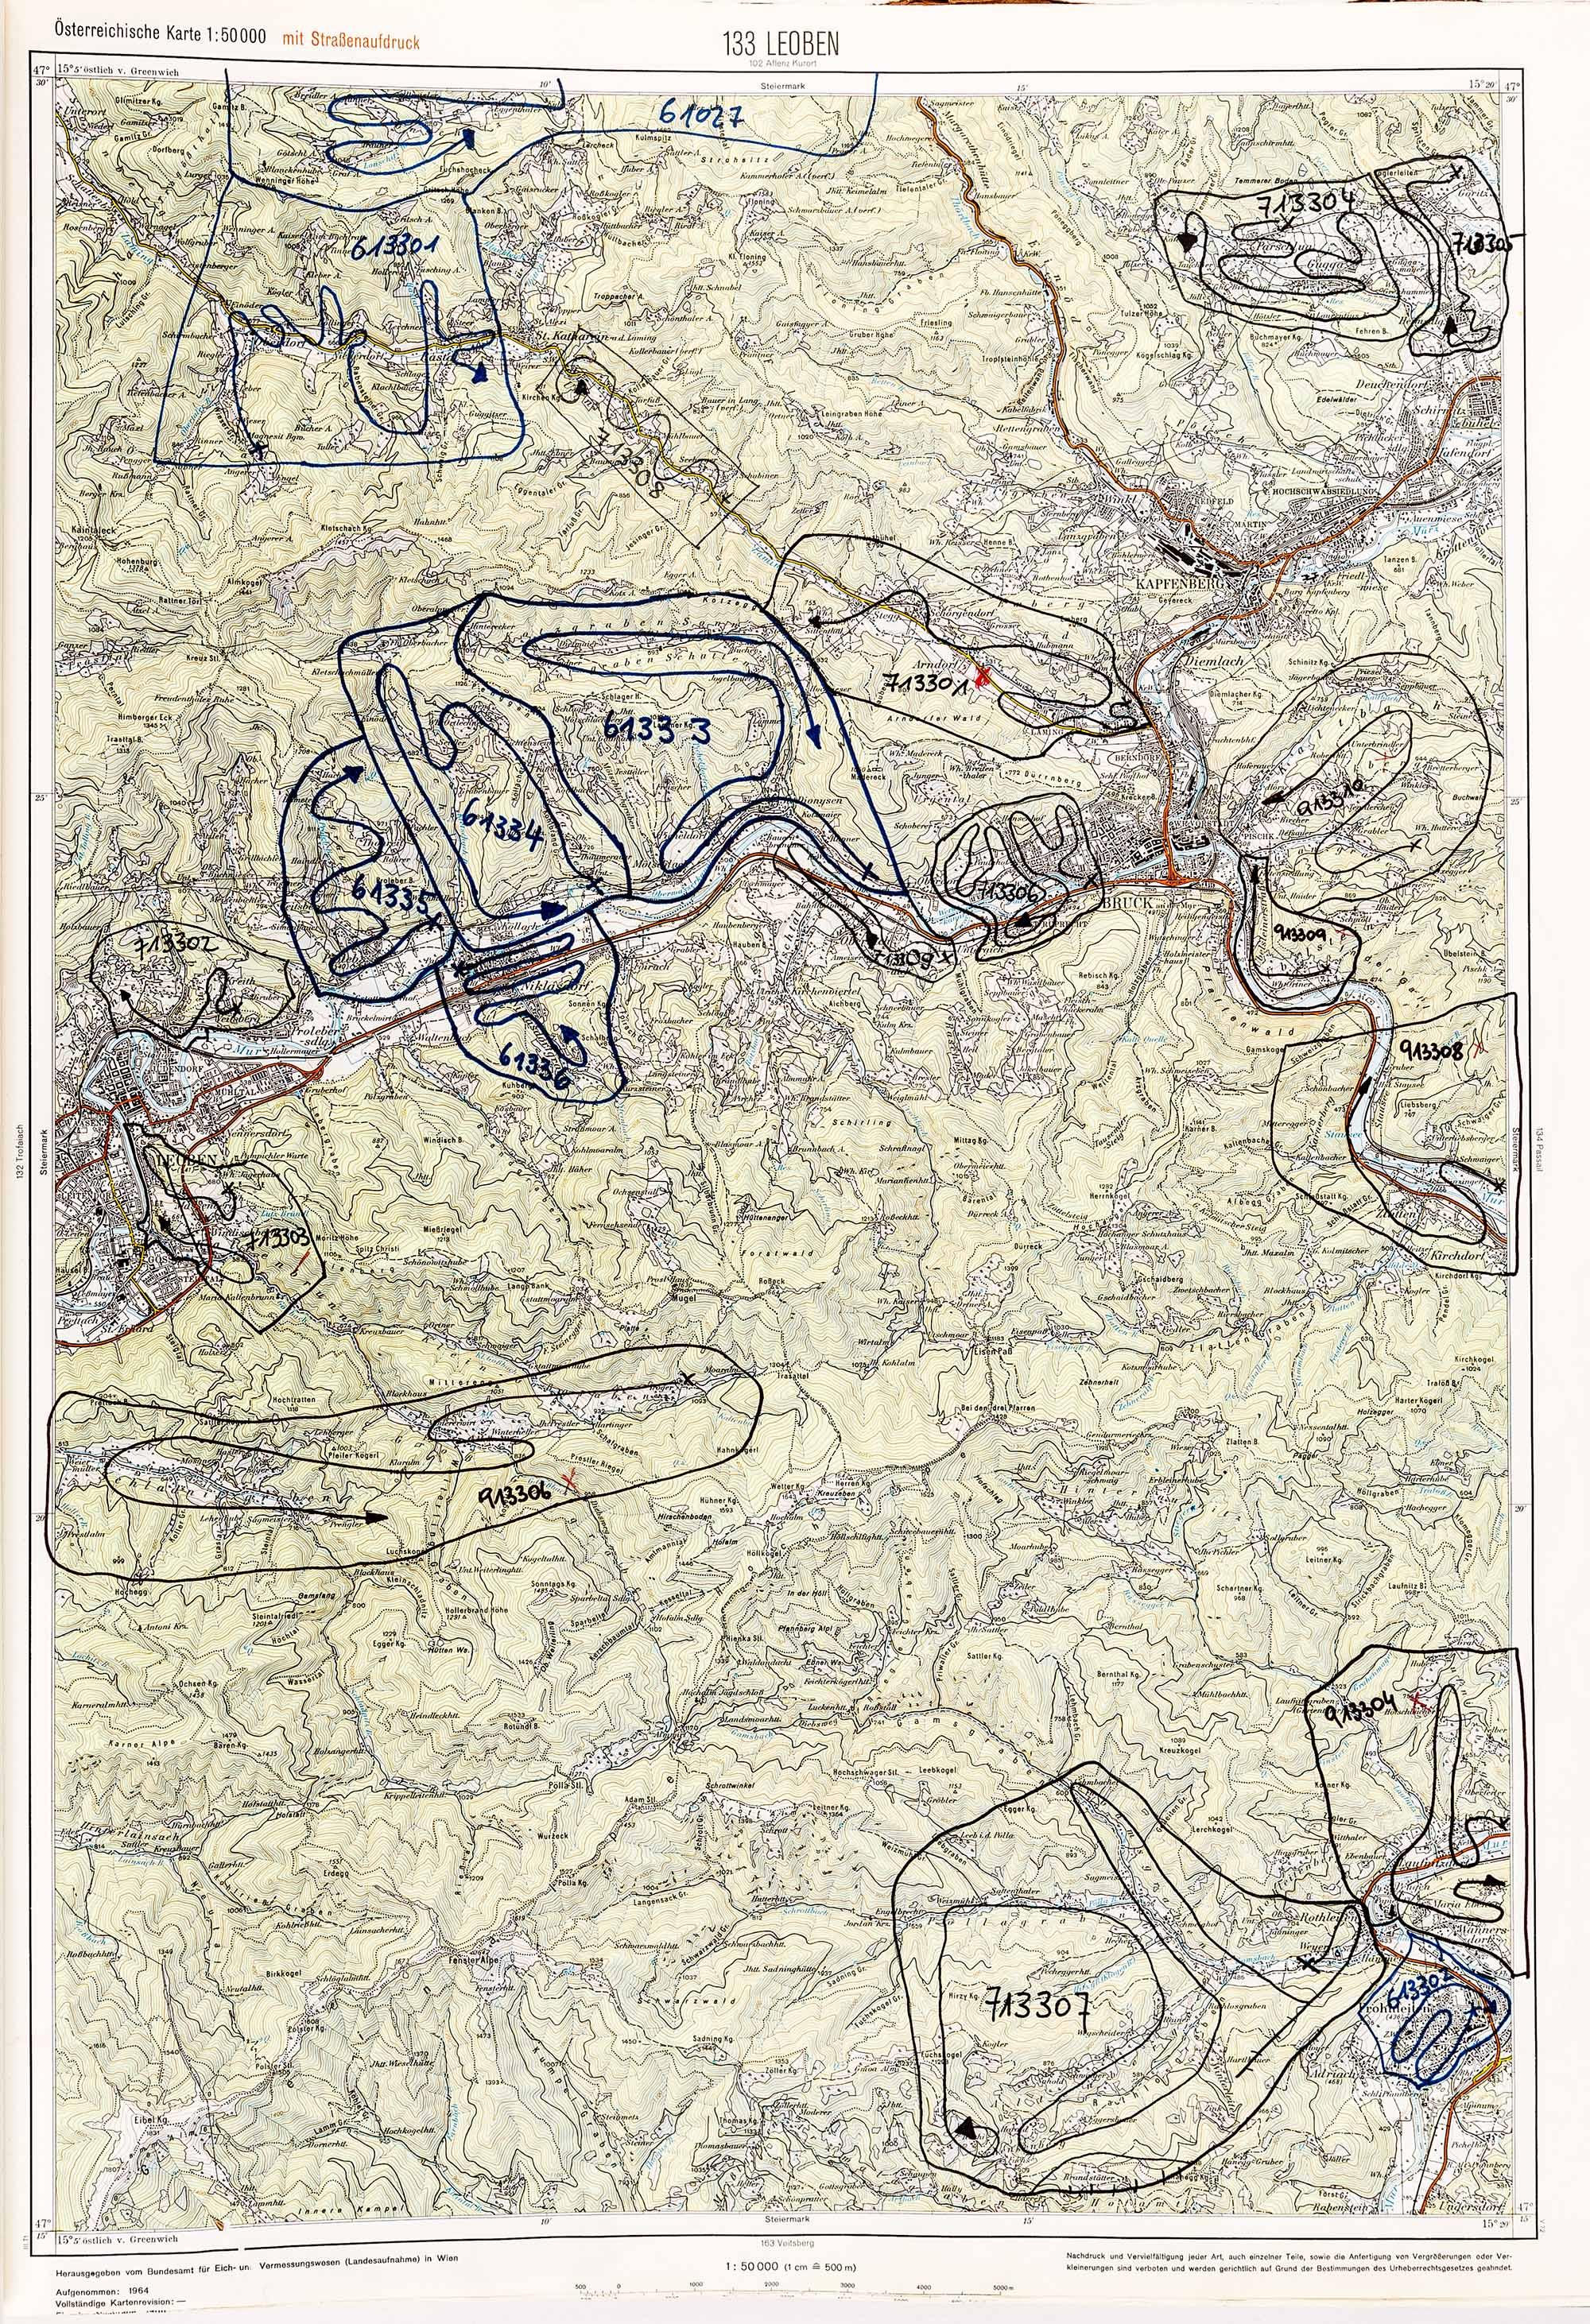 1975-1979 Karte 133